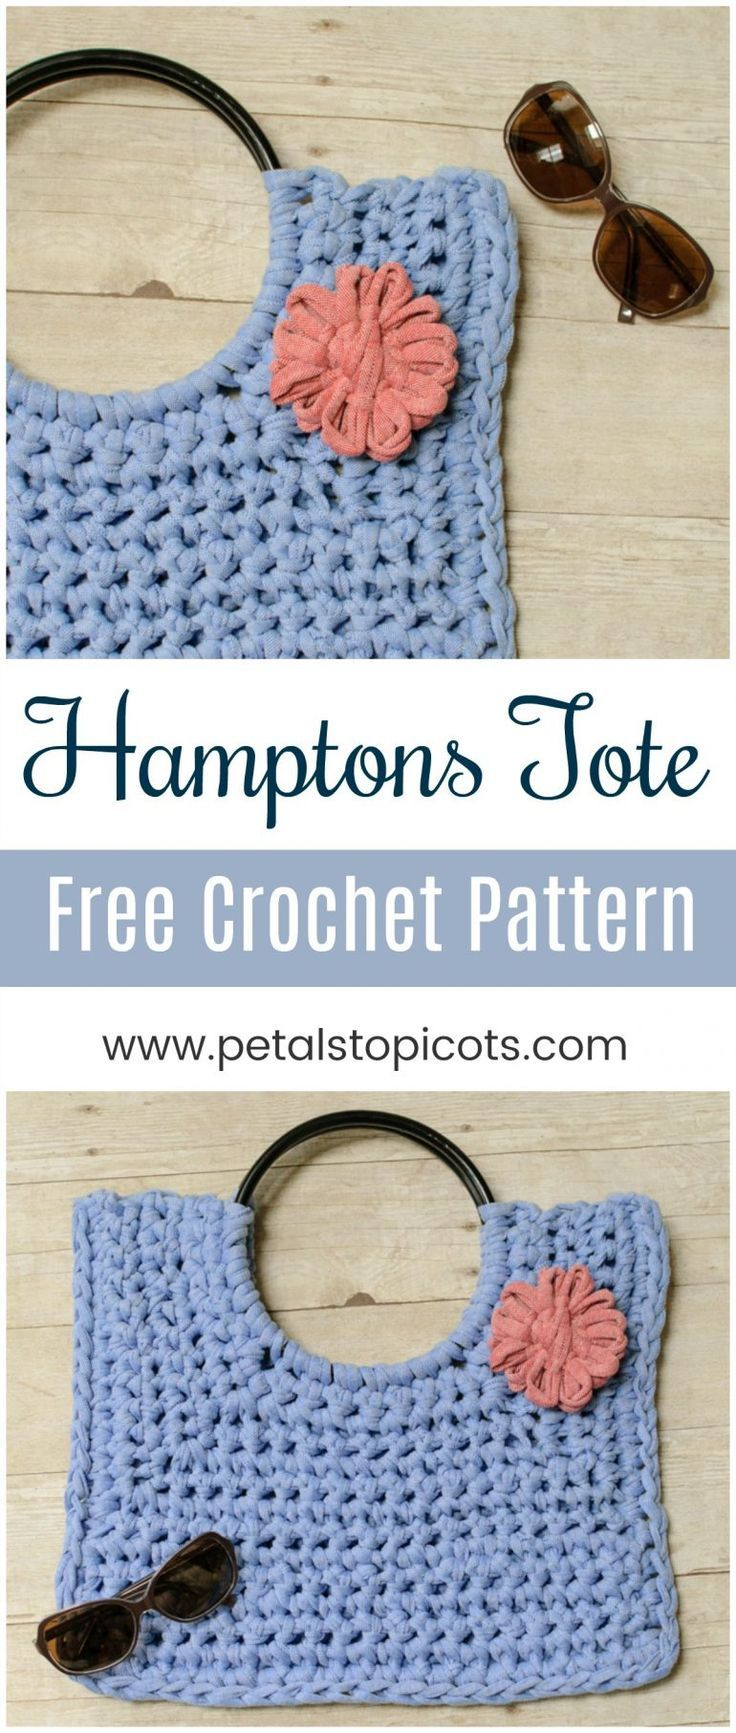 Hamptons Tote T Shirt Yarn Crochet Bag Pattern Crochetholic